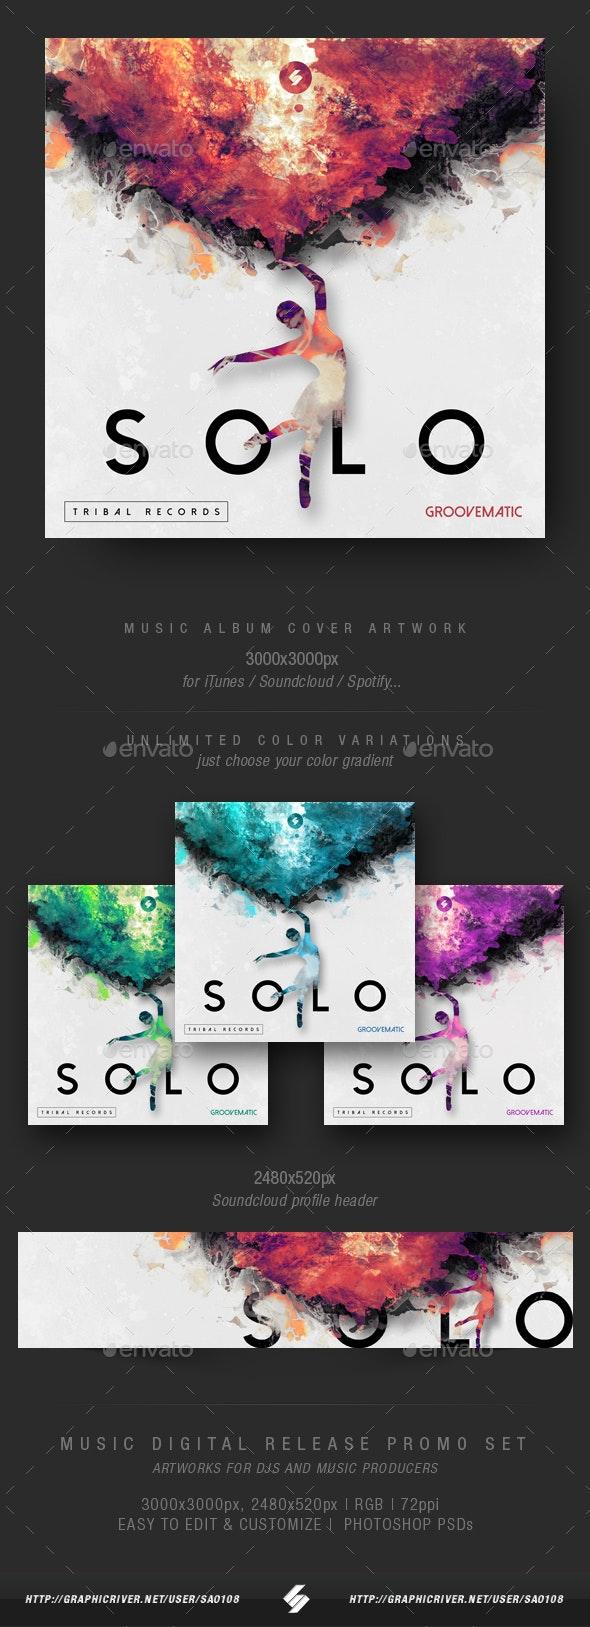 Solo - Music Album Cover Artwork Template - Miscellaneous Social Media